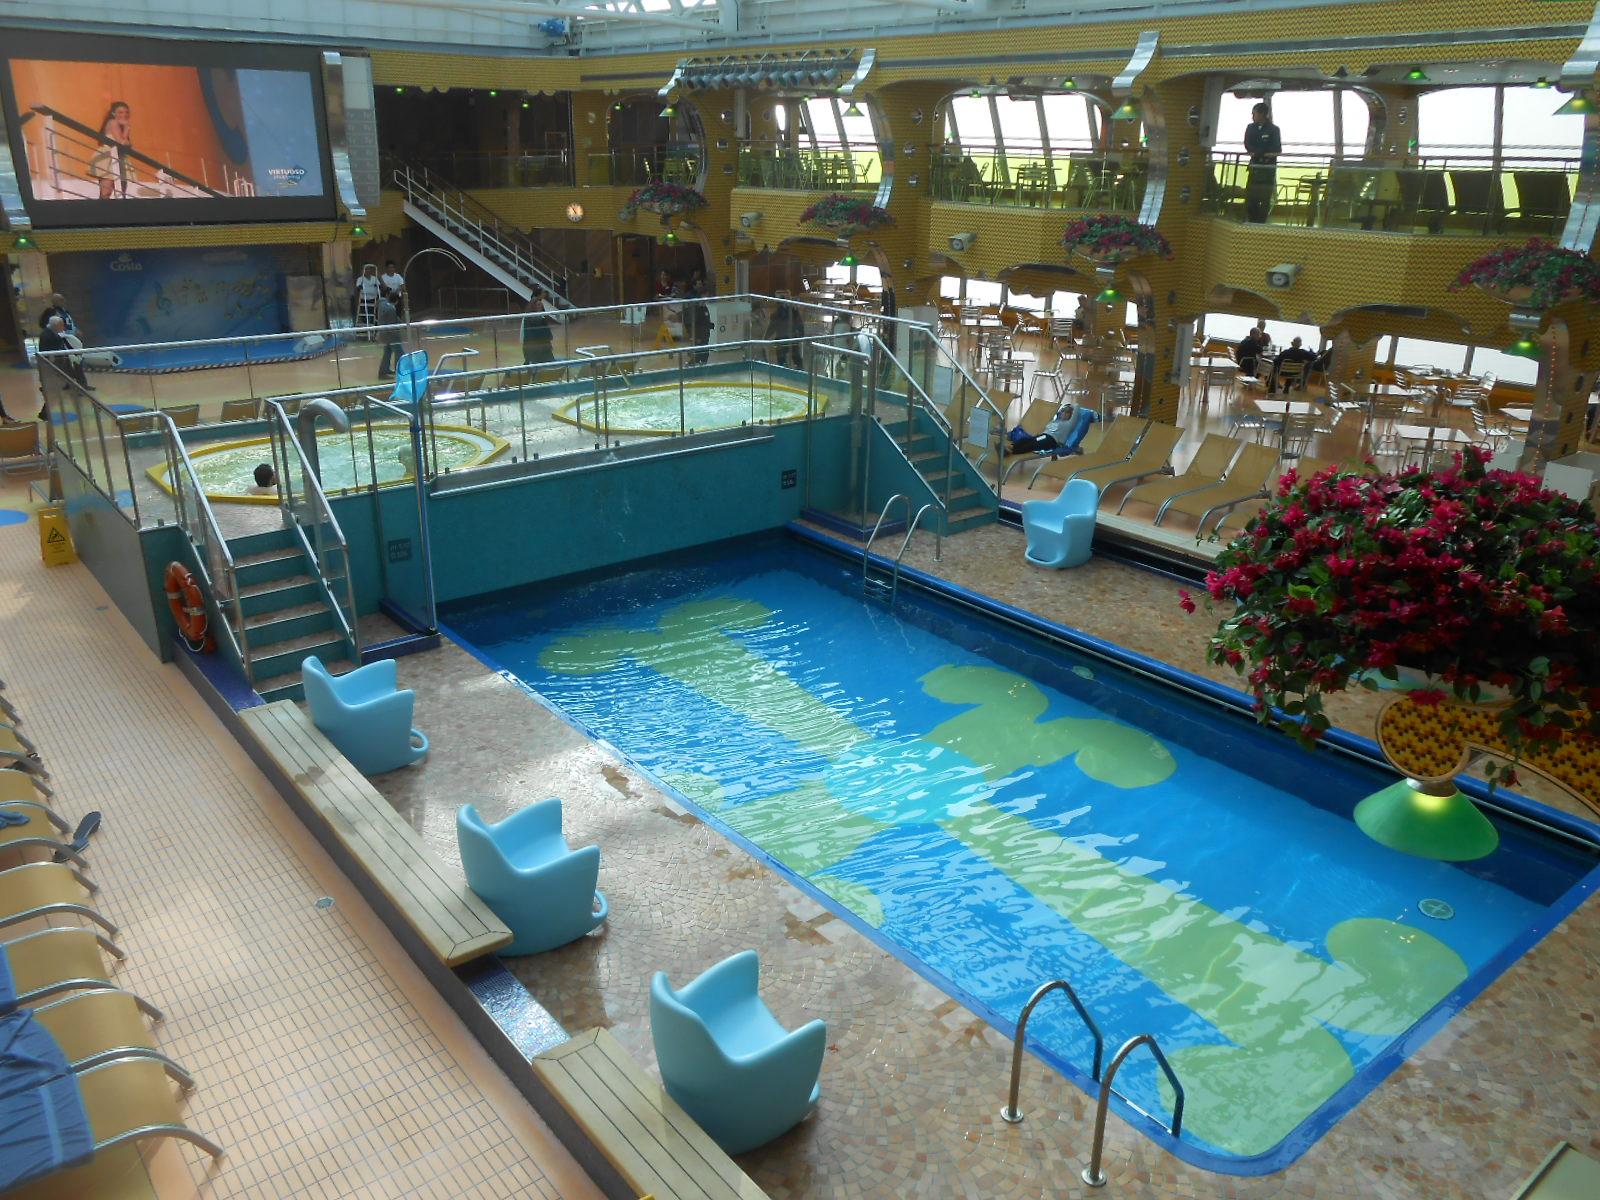 DSCN9937 Pool